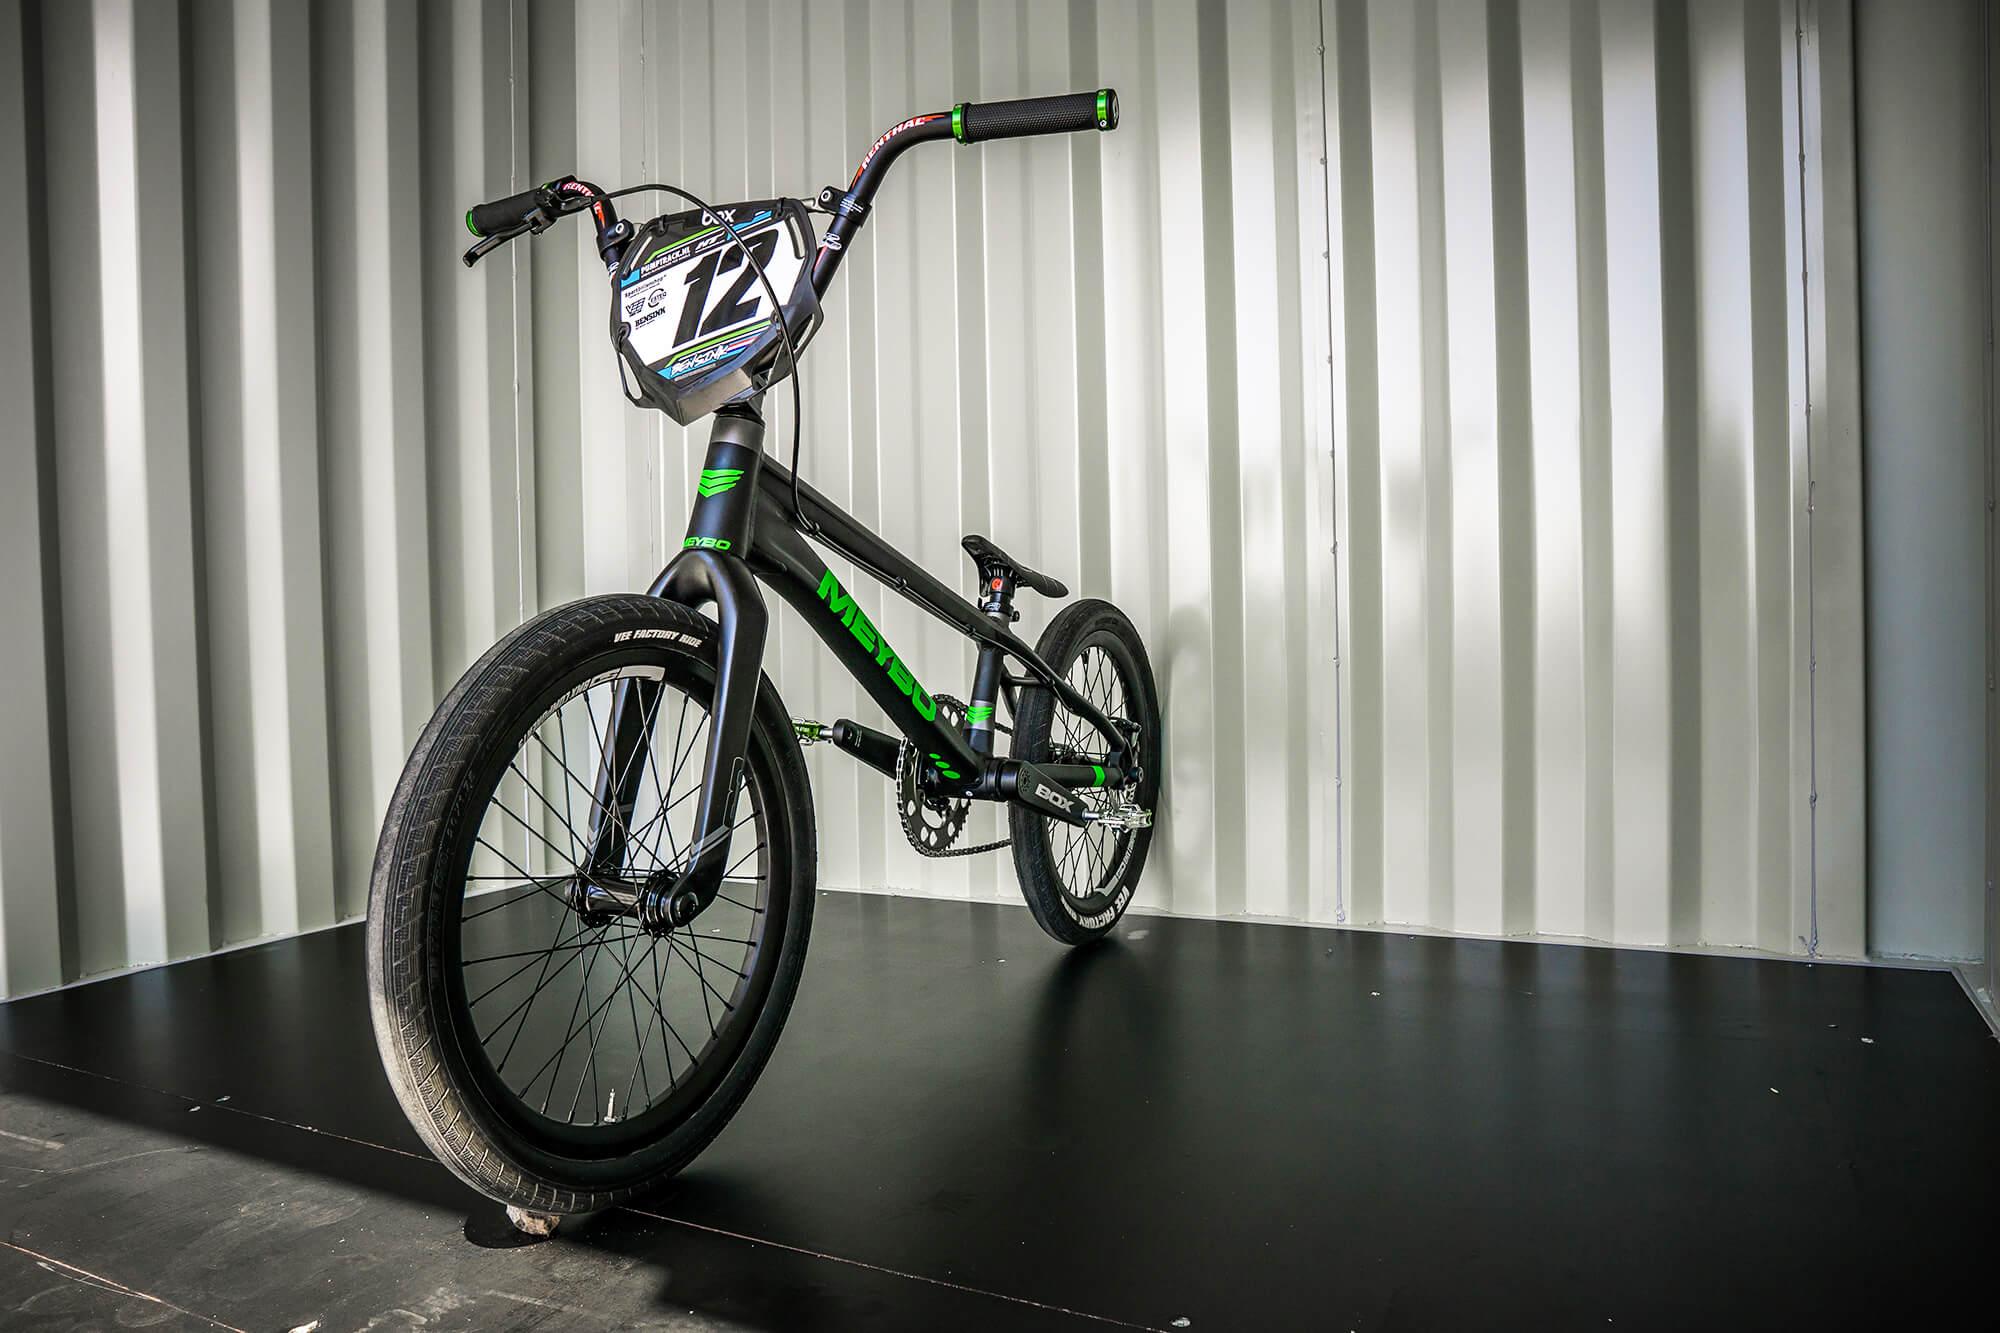 Team Oegema TVE Bike Check 2020 - DSC02163 - Niel Bensink